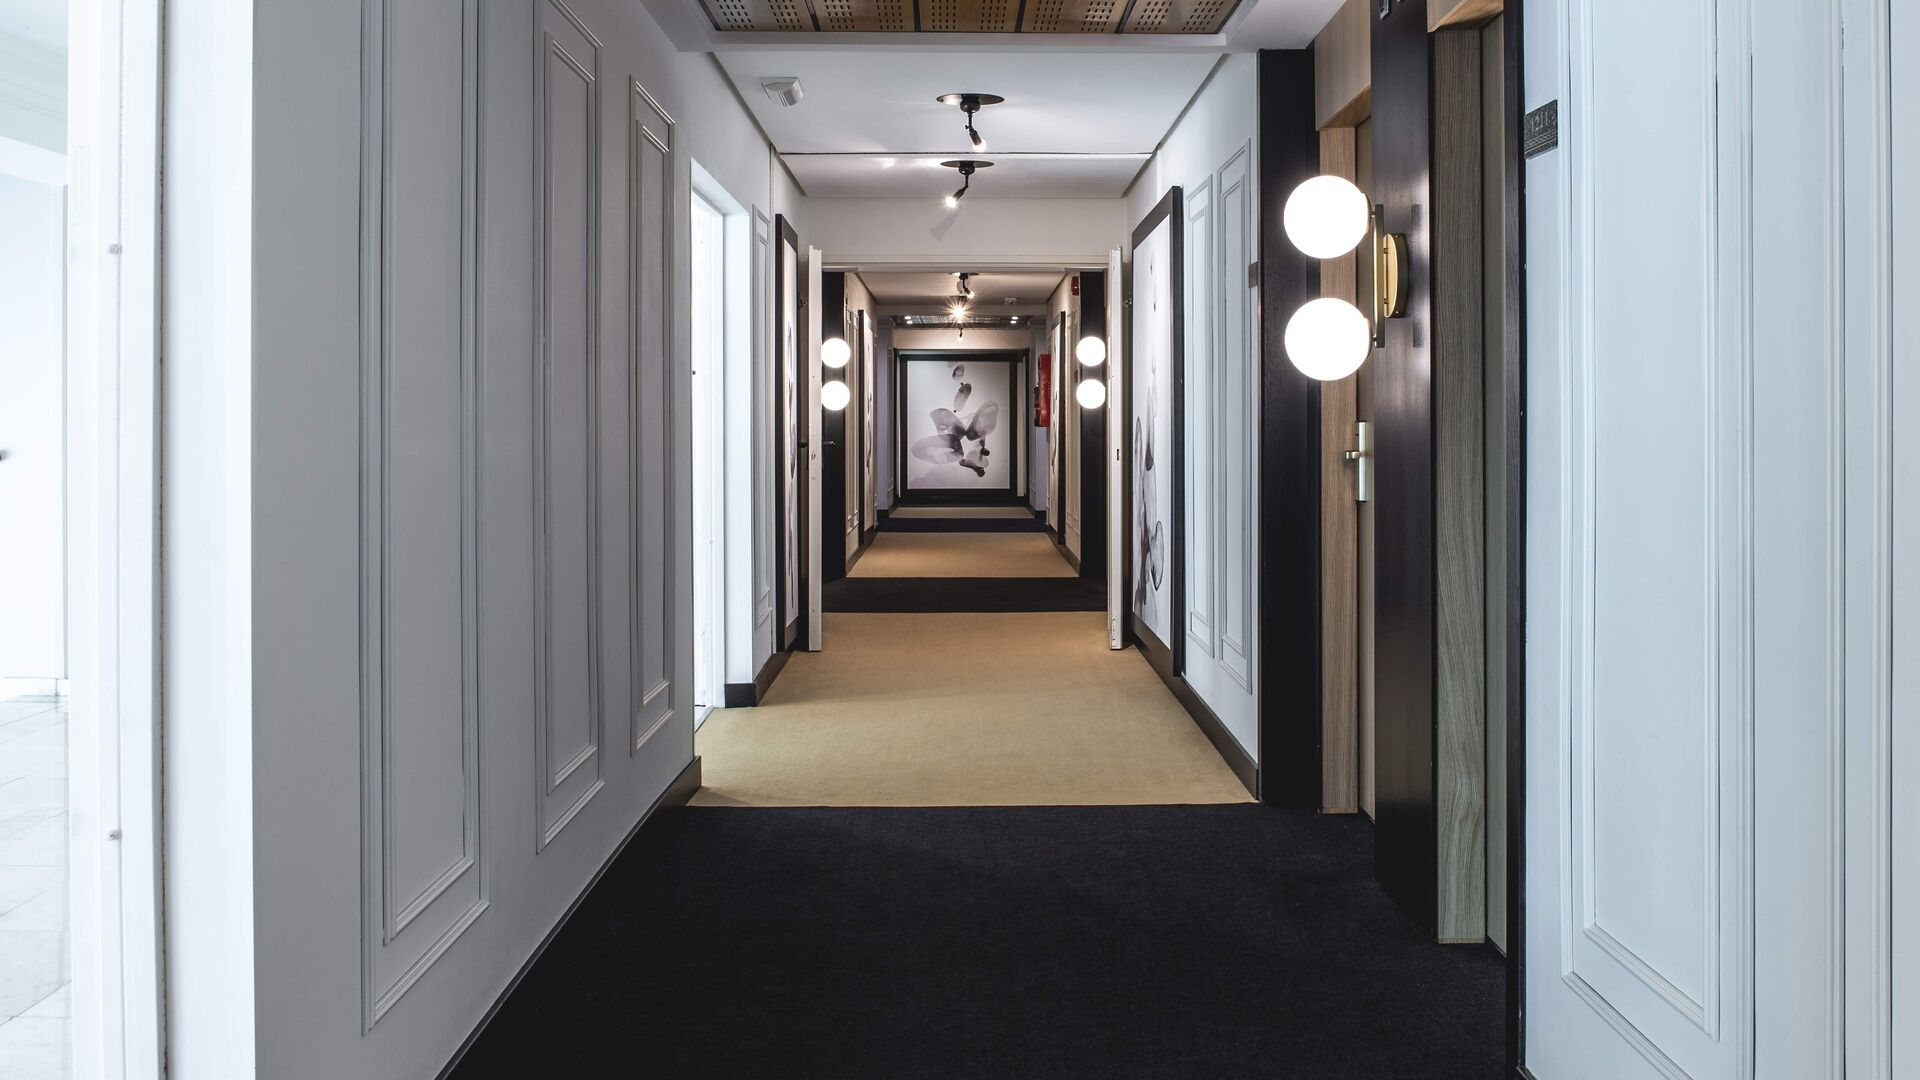 https://cms.satur.sk/data/imgs/tour_image/orig/hotel-18-1952172.jpg